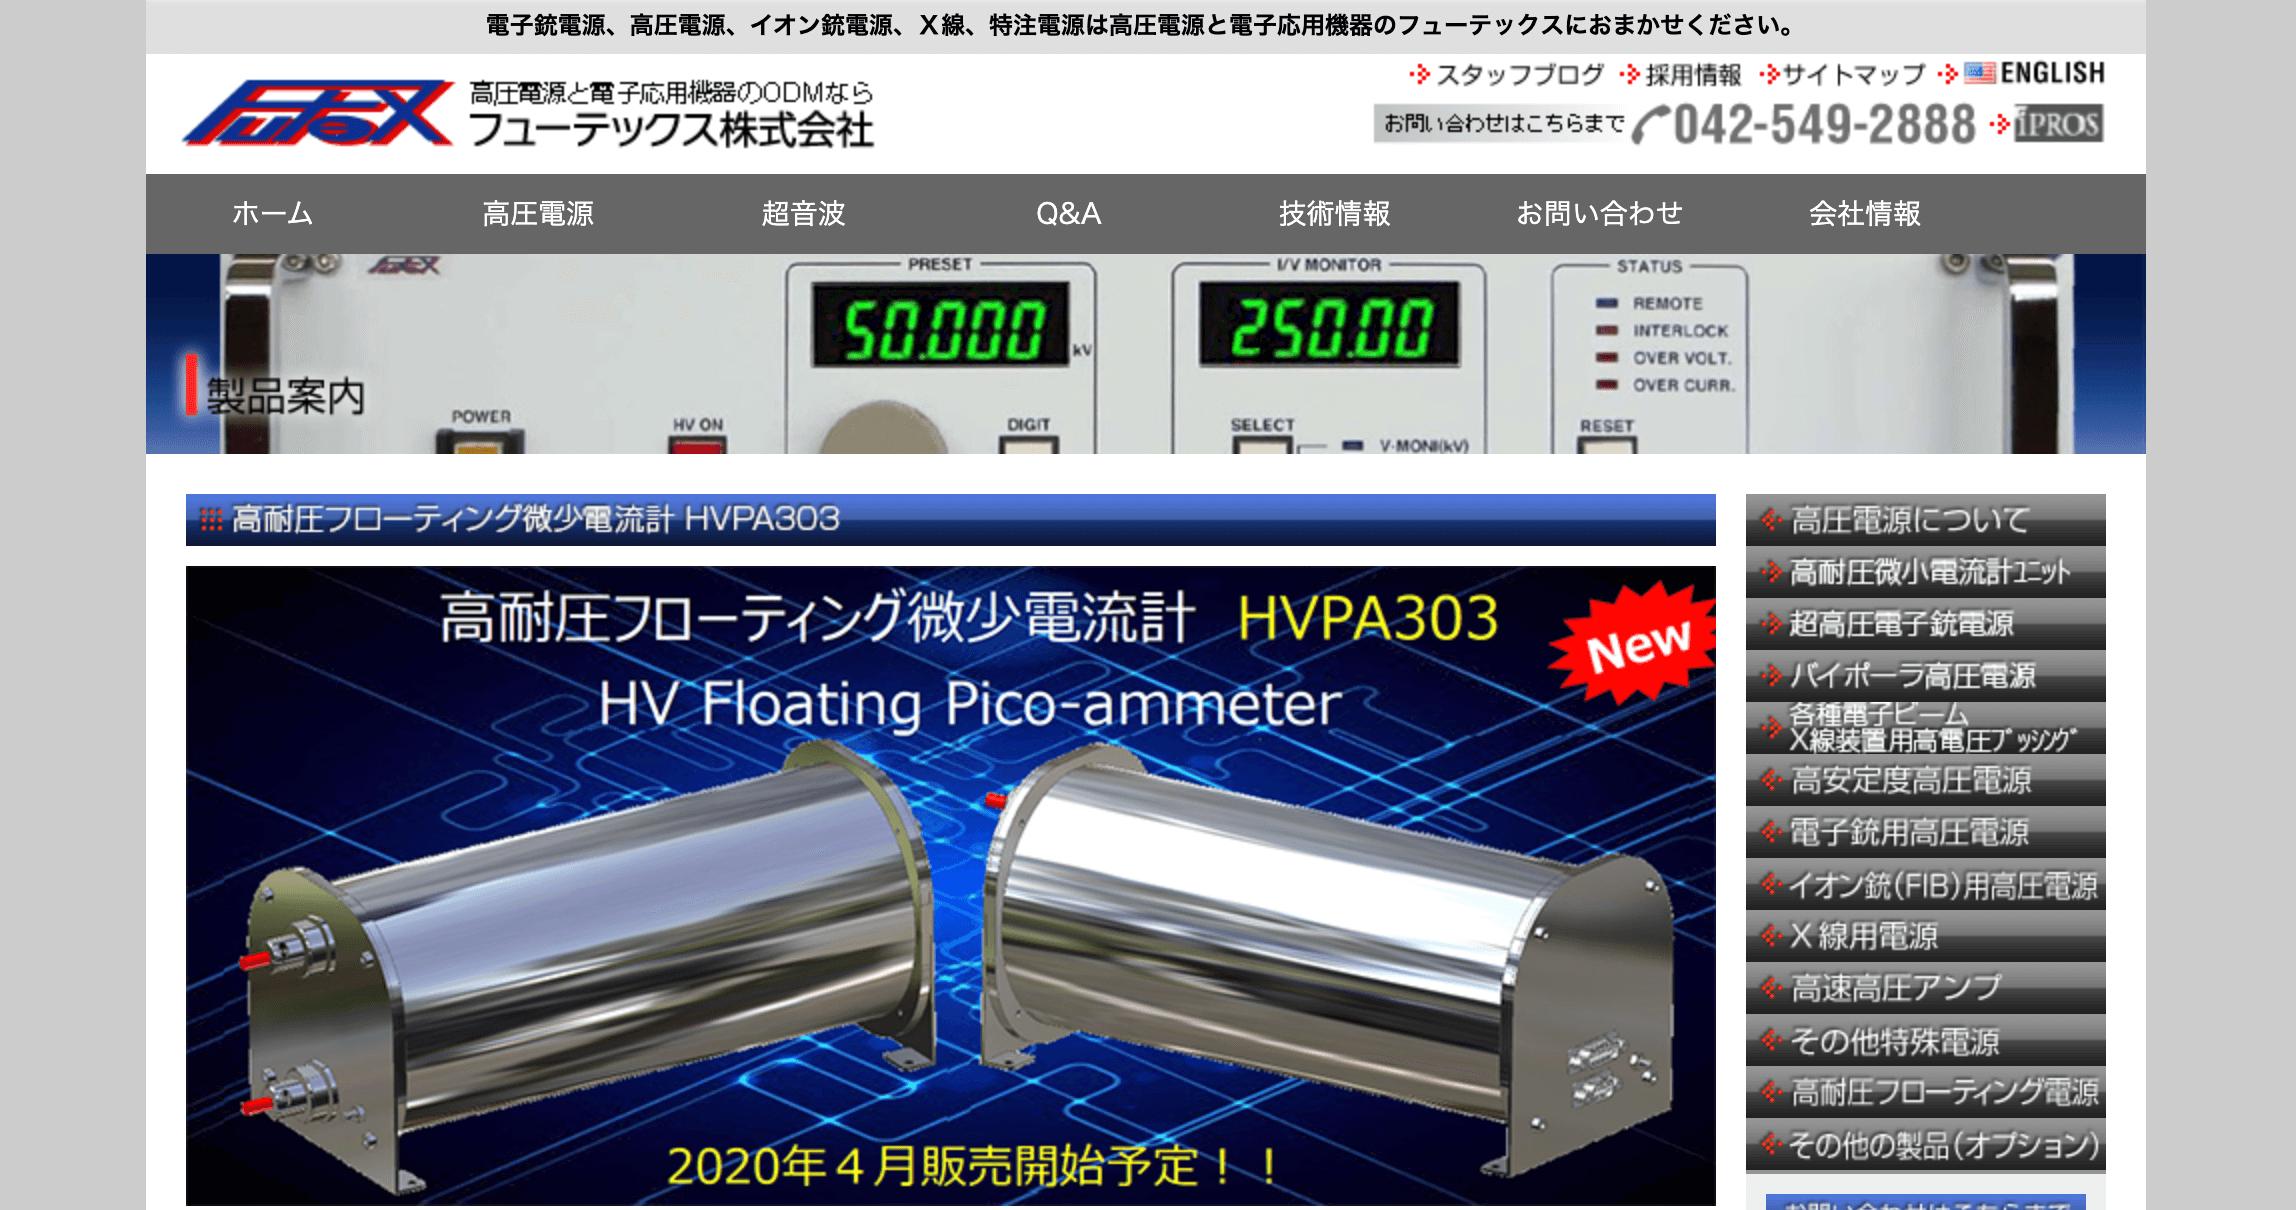 HVPA303